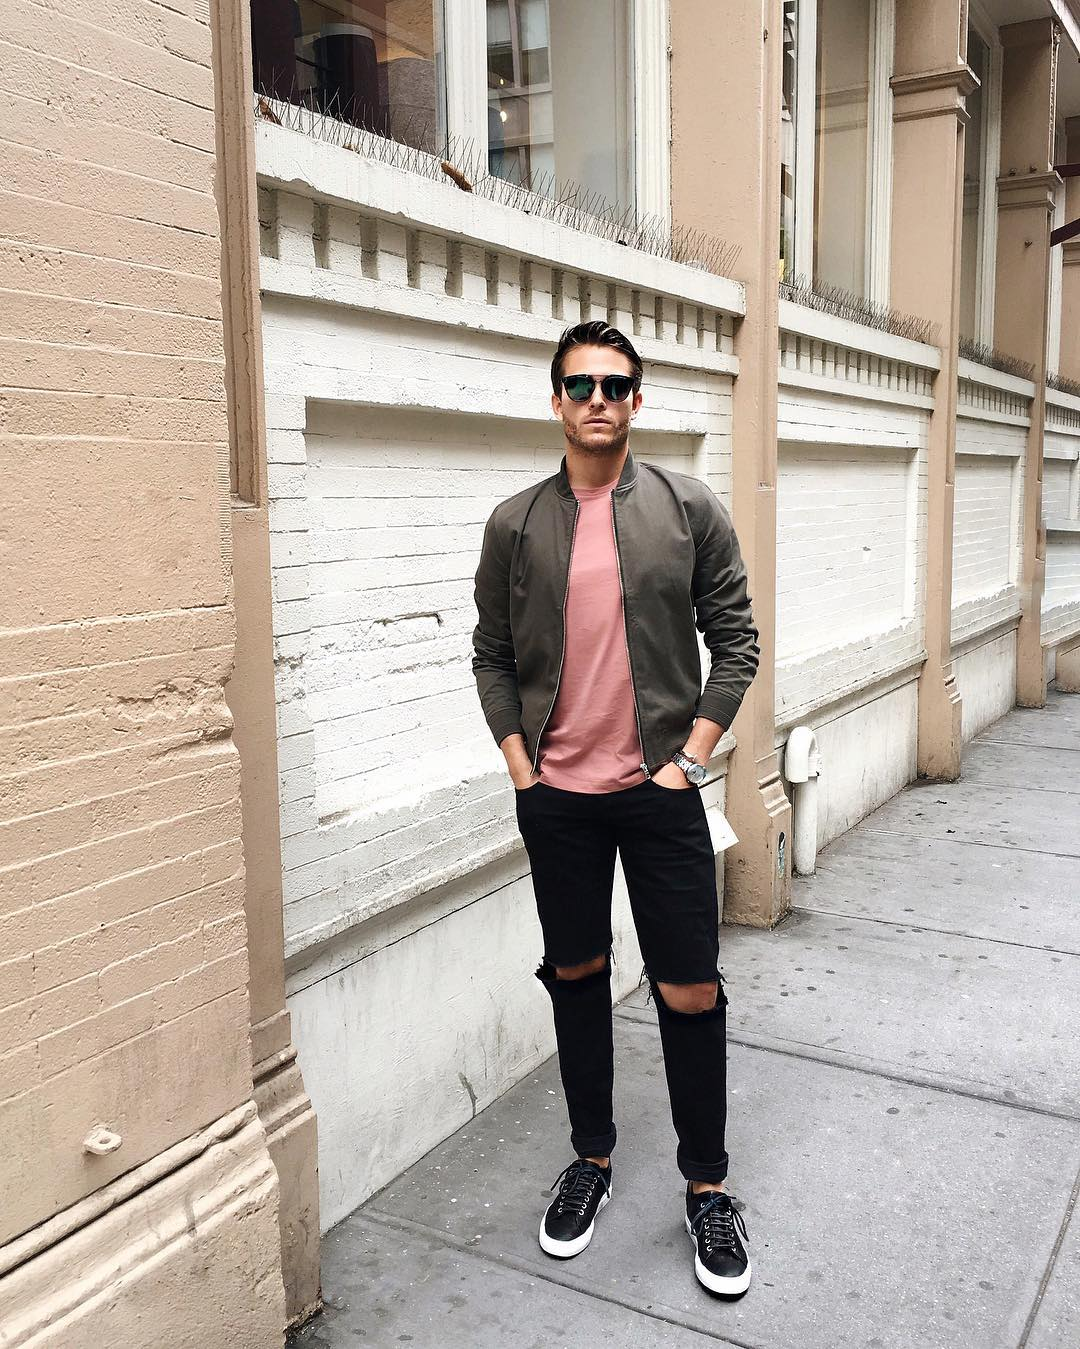 roze kleding stijltips MAN MAN